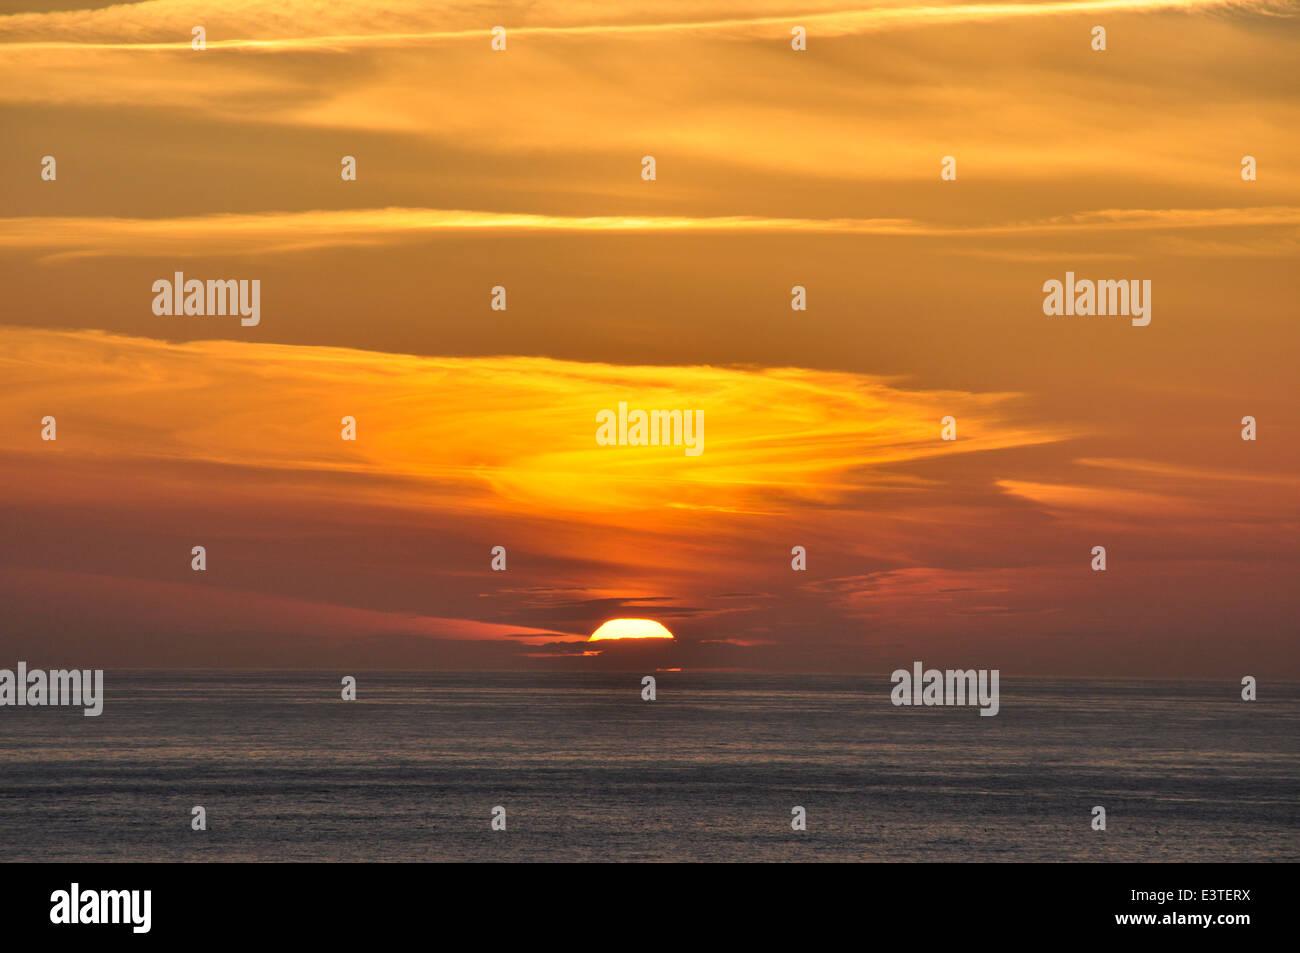 Cornwall - North Coast Path - Sonnenuntergang über dem Meer - Orange - rot - gold - Himmel über einem Stockbild